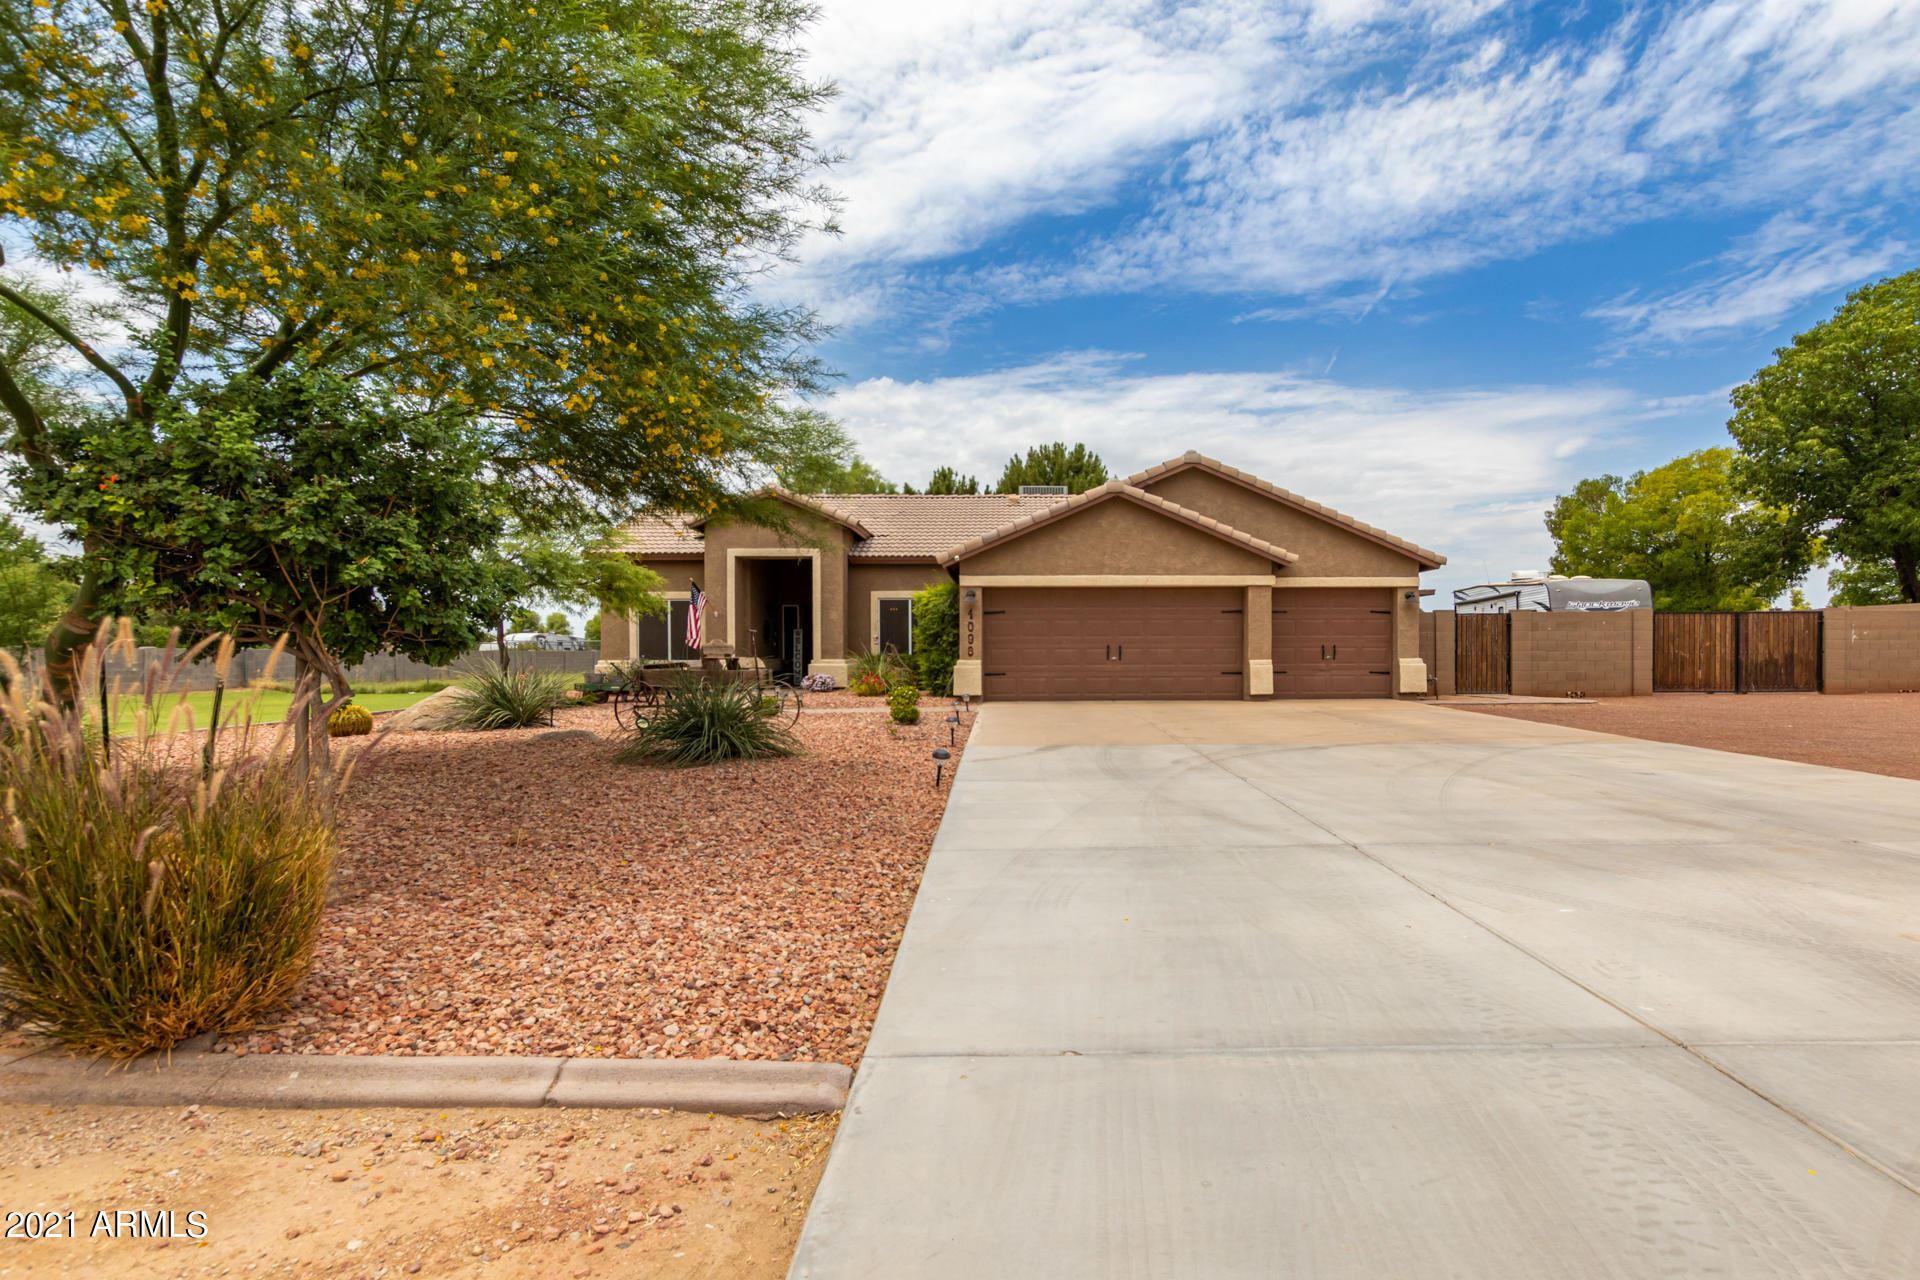 4098 S EMERALD Drive, Buckeye, AZ 85326 - MLS#: 6258356